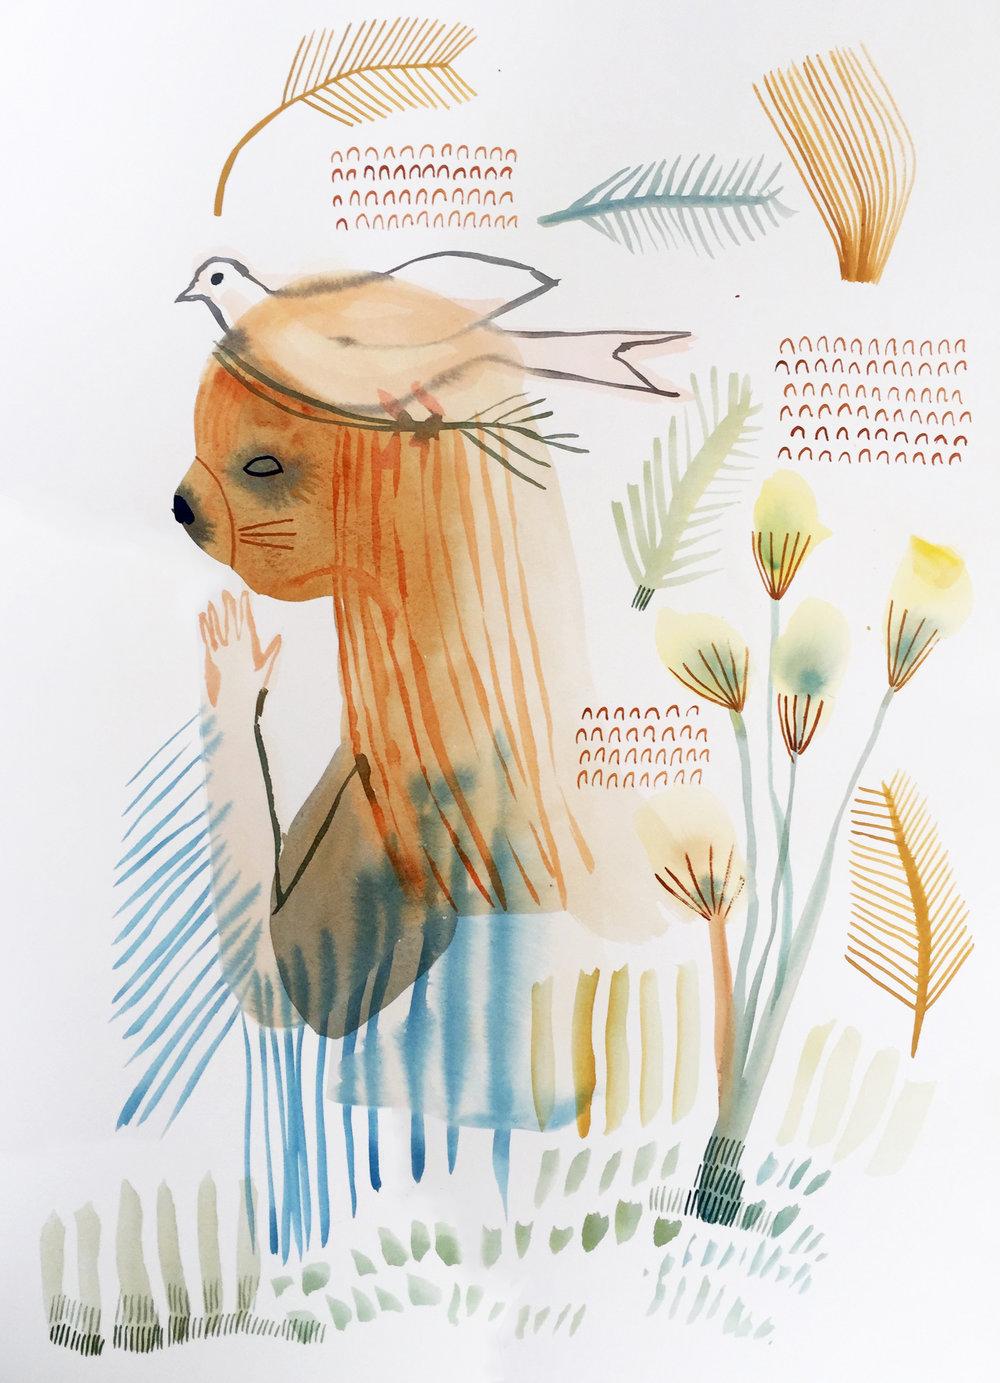 Peace Prayer , Ashley Amery, 2018, Gouache on paper, 35 x 54 cm